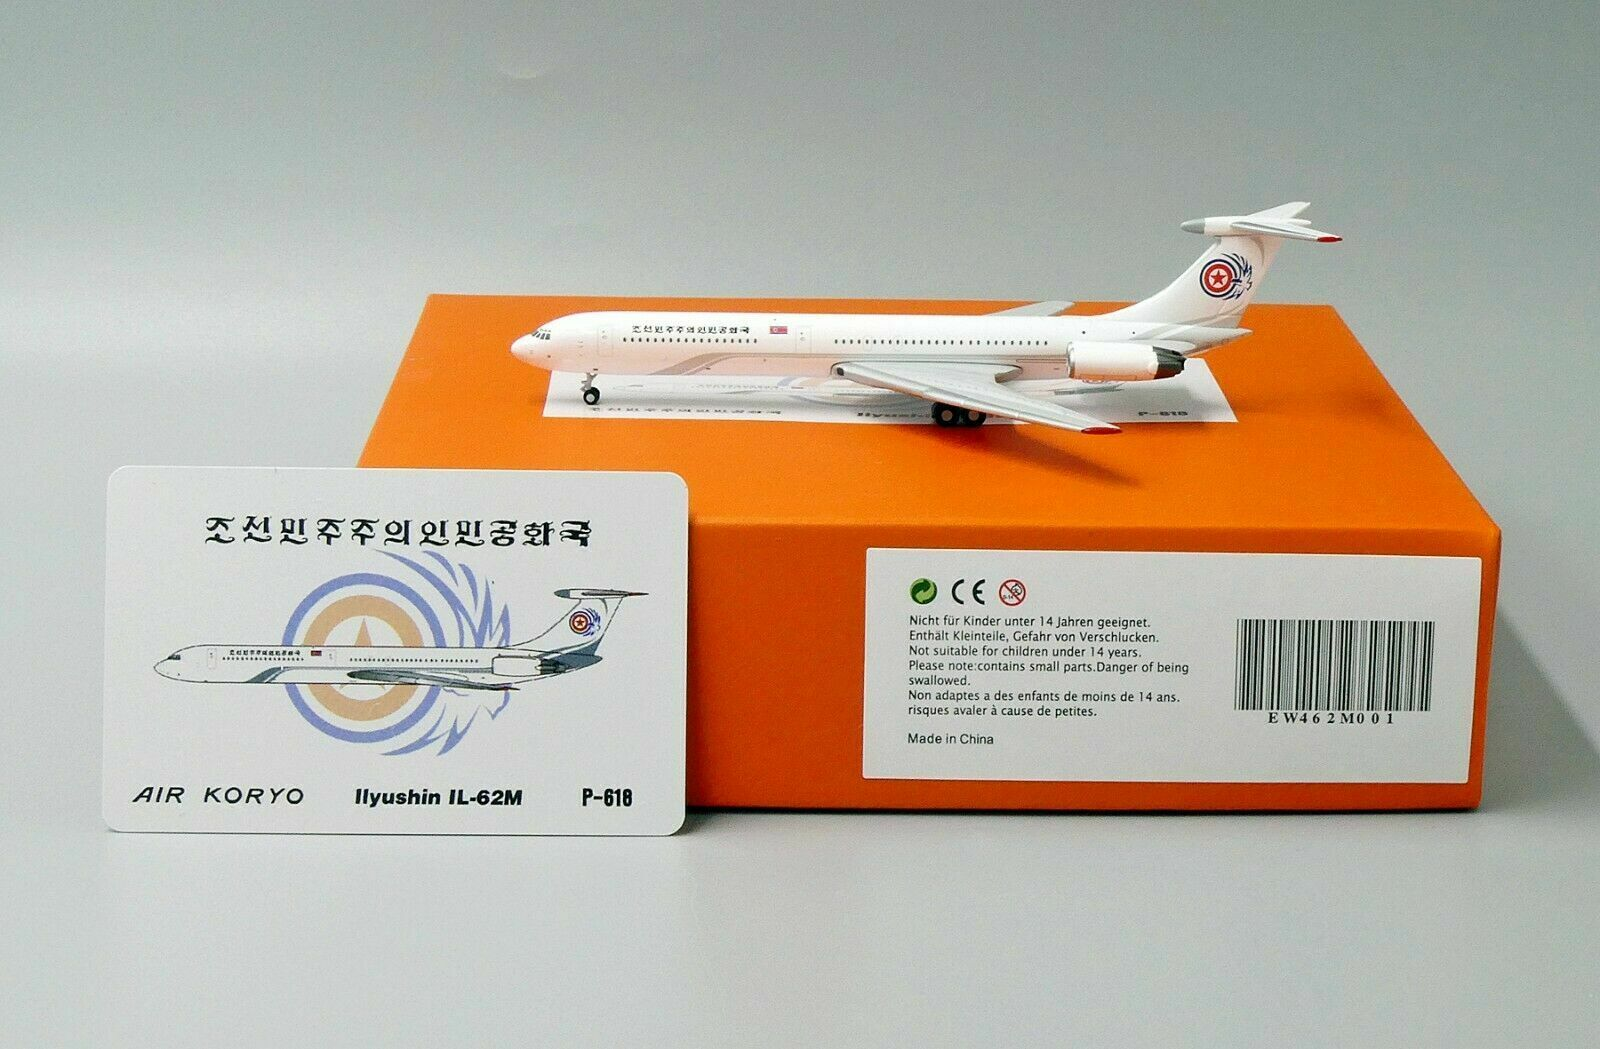 JC Wings 1 400 Air Koryo Ilyushin IL-62M 'New Colours' P-618